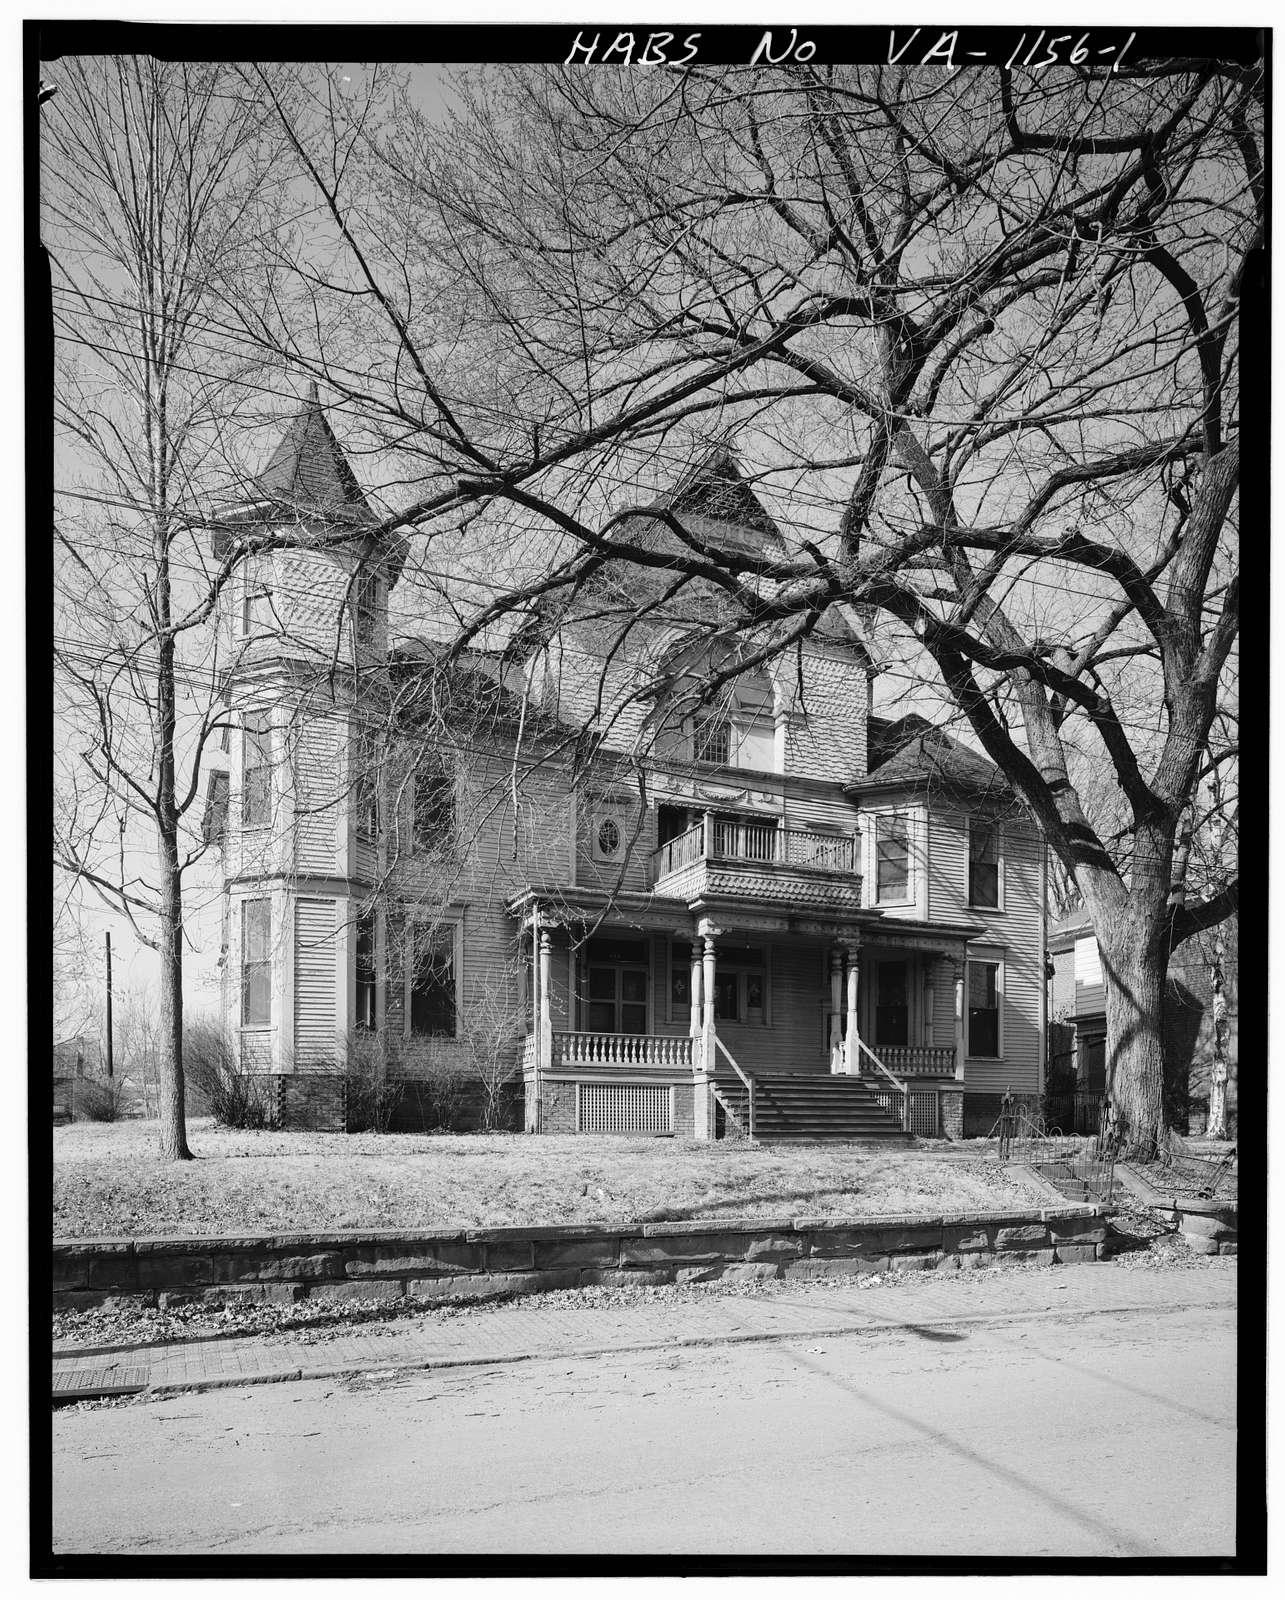 Robert Withers Massie House, Federal & Tenth Streets, Lynchburg, Lynchburg, VA